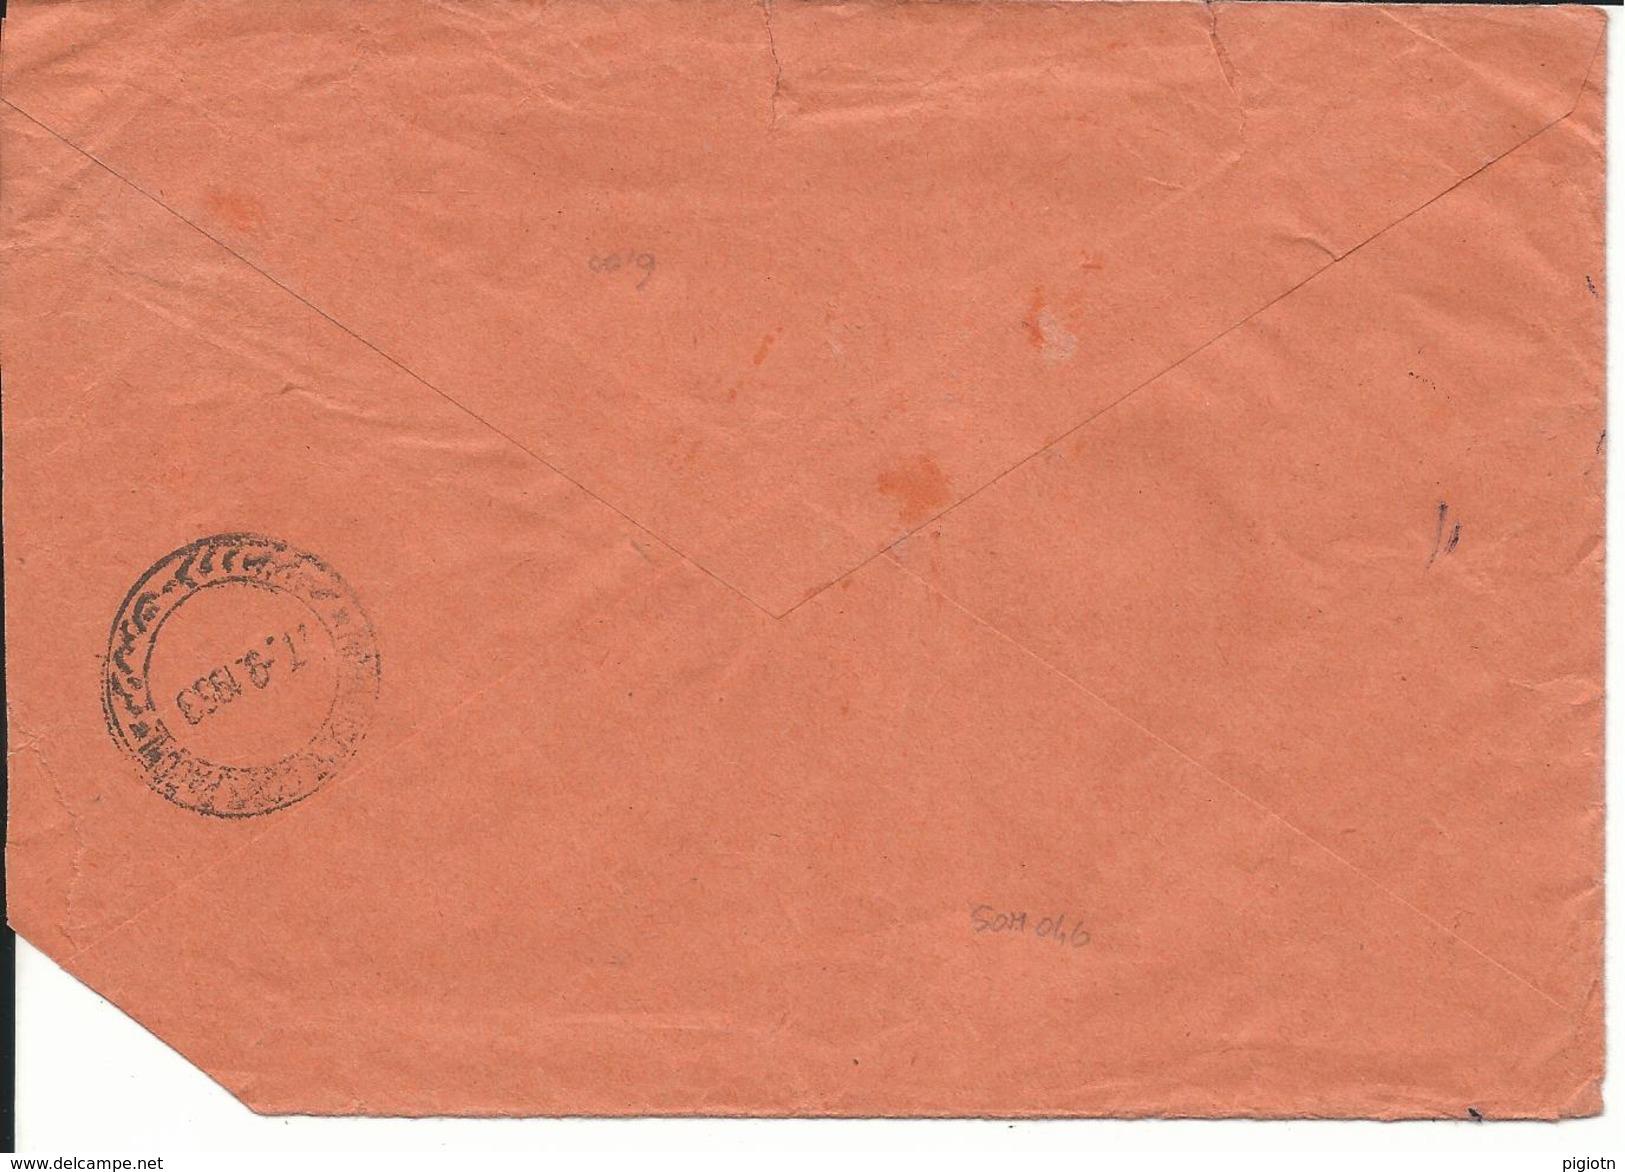 SOM046 - SOMALIA - LETTERA PER L'INTERNO - MOGADISCIO -  VIAGGIATA 17.09.1963 - Somalia (1960-...)